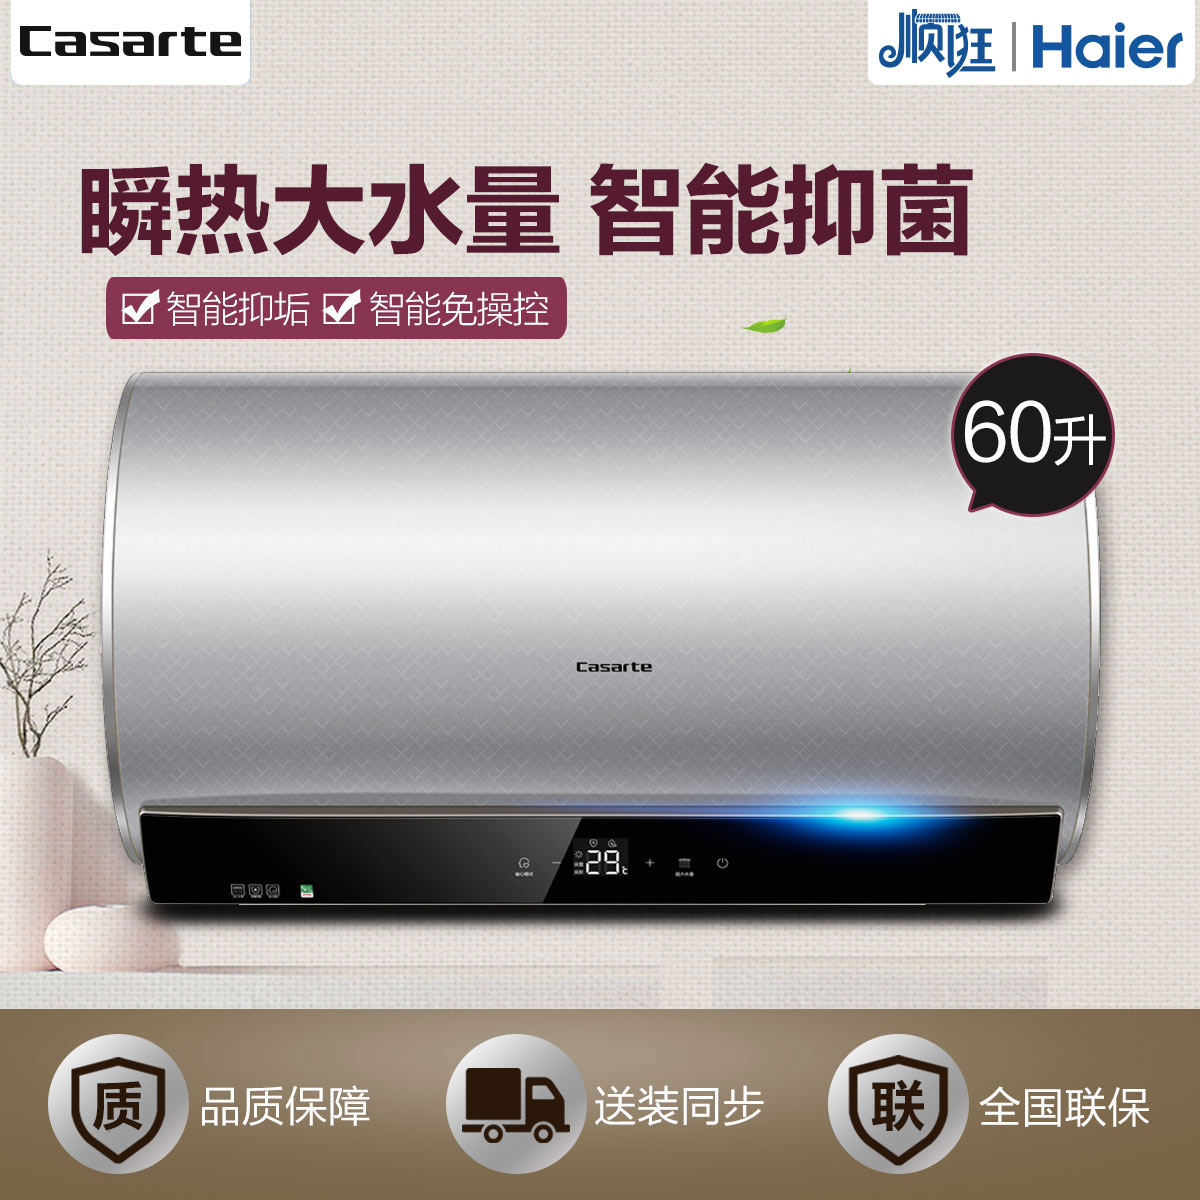 Casarte/卡萨帝             热水器             CEH-60V(银)